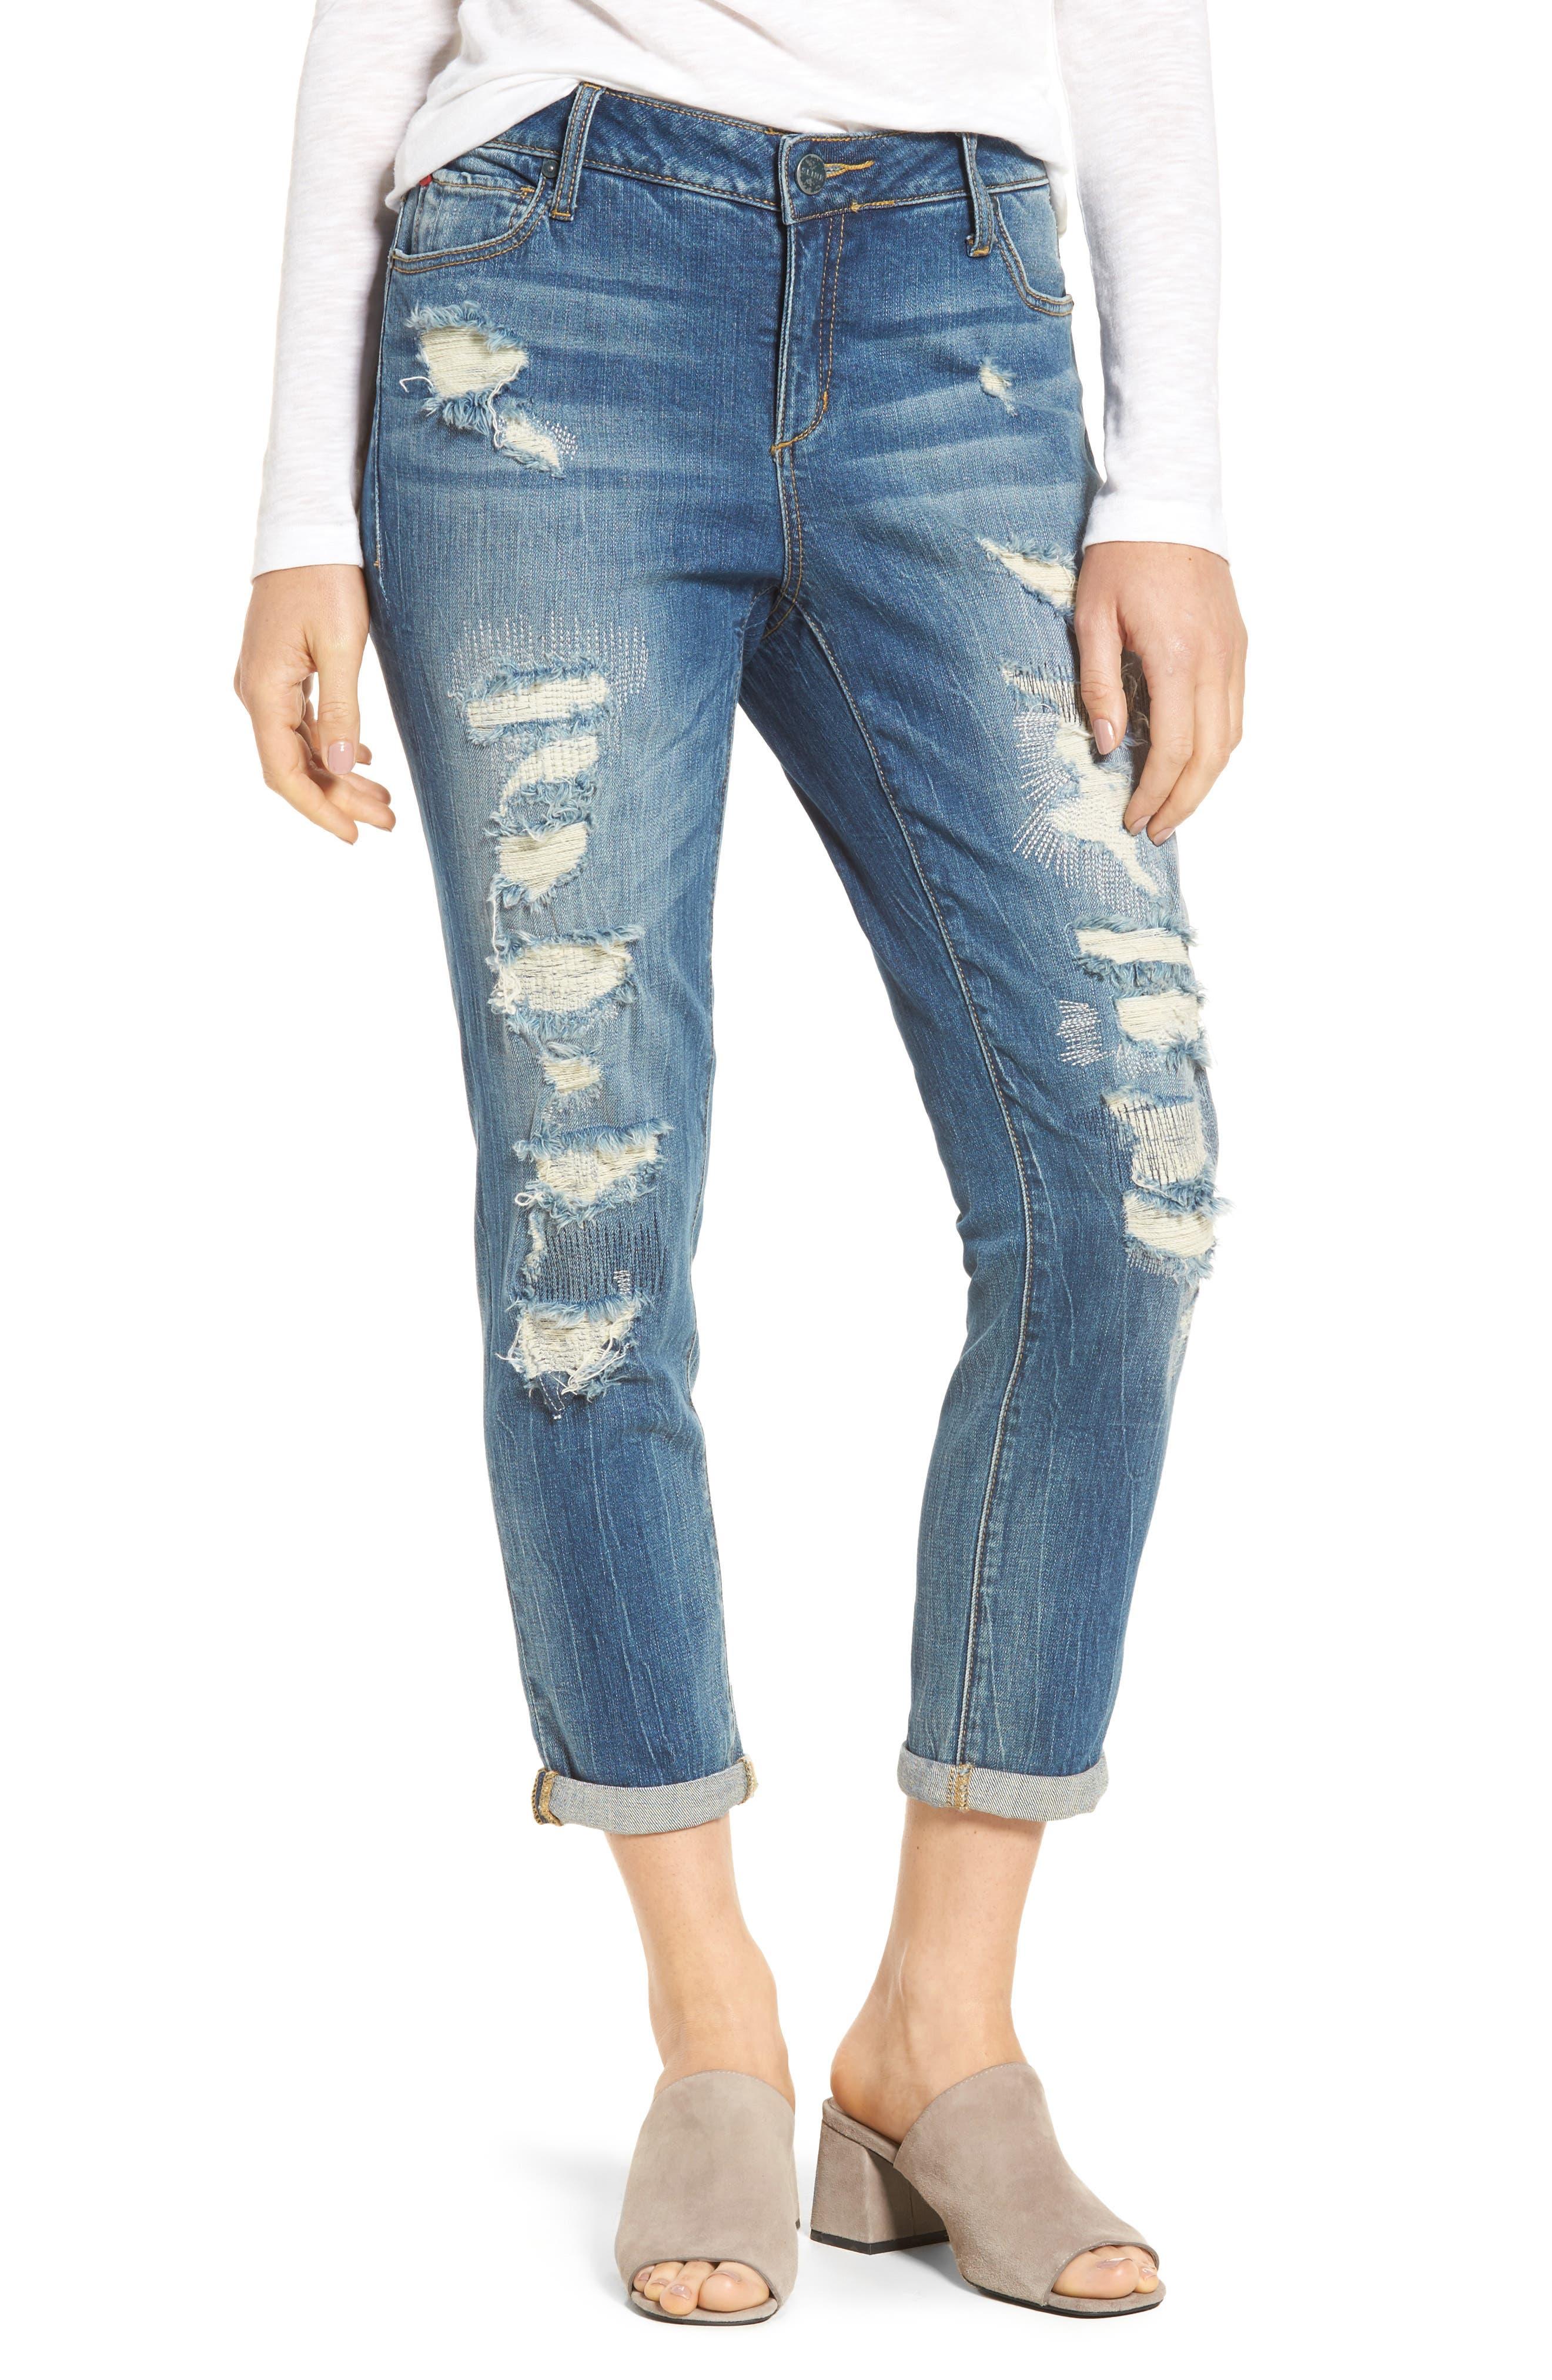 SLINK JEANS, Distressed Ankle Boyfriend Jeans, Main thumbnail 1, color, 456